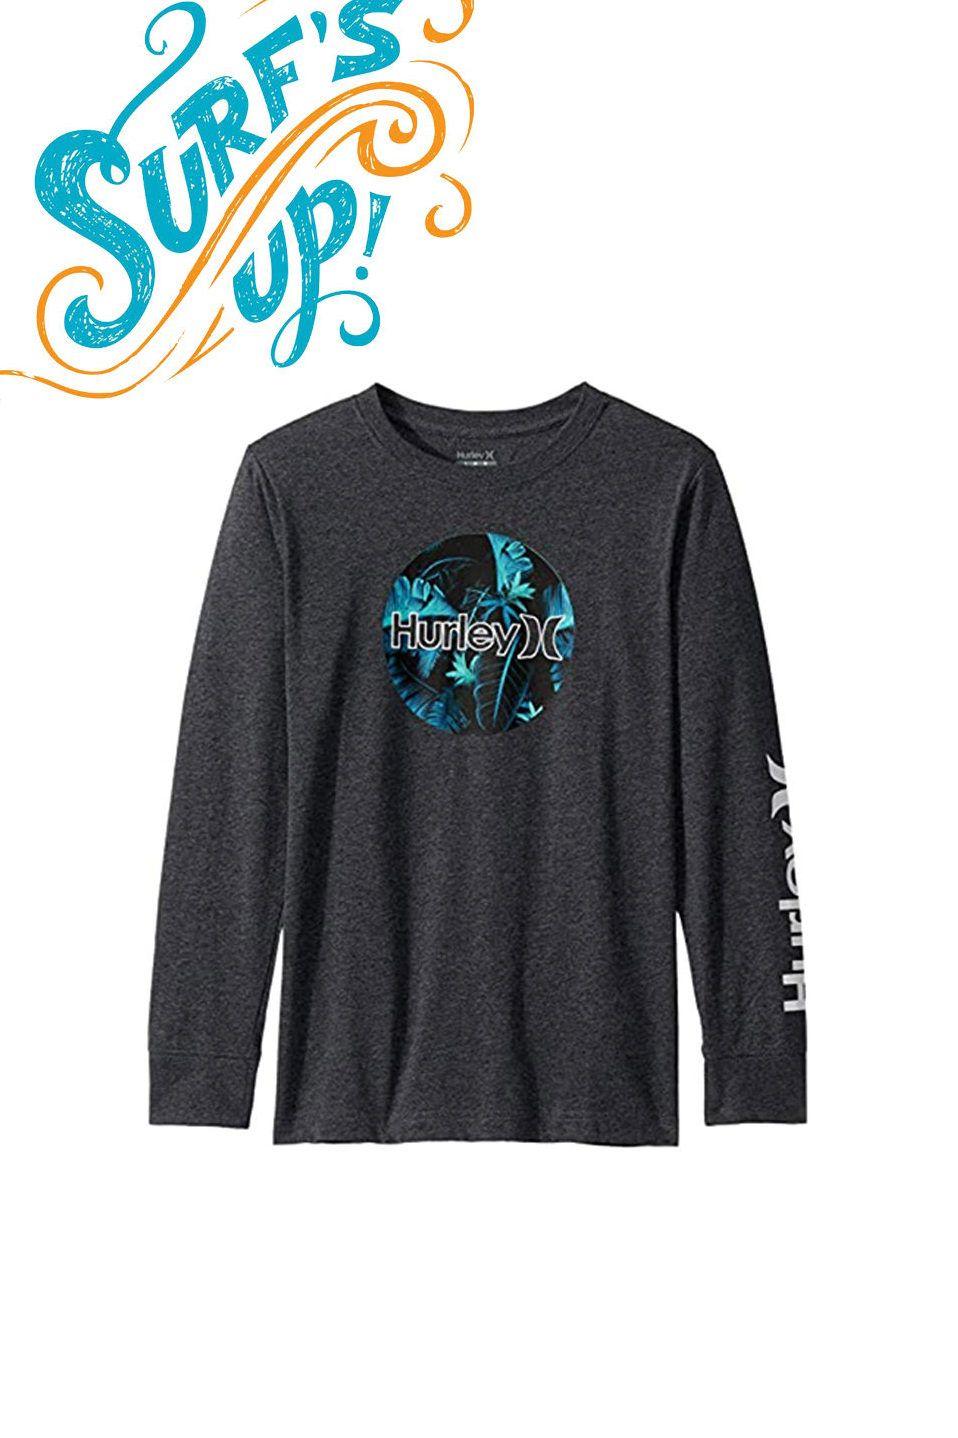 Boy/'s Youth Hurley Long Sleeve Cotton T-Shirt